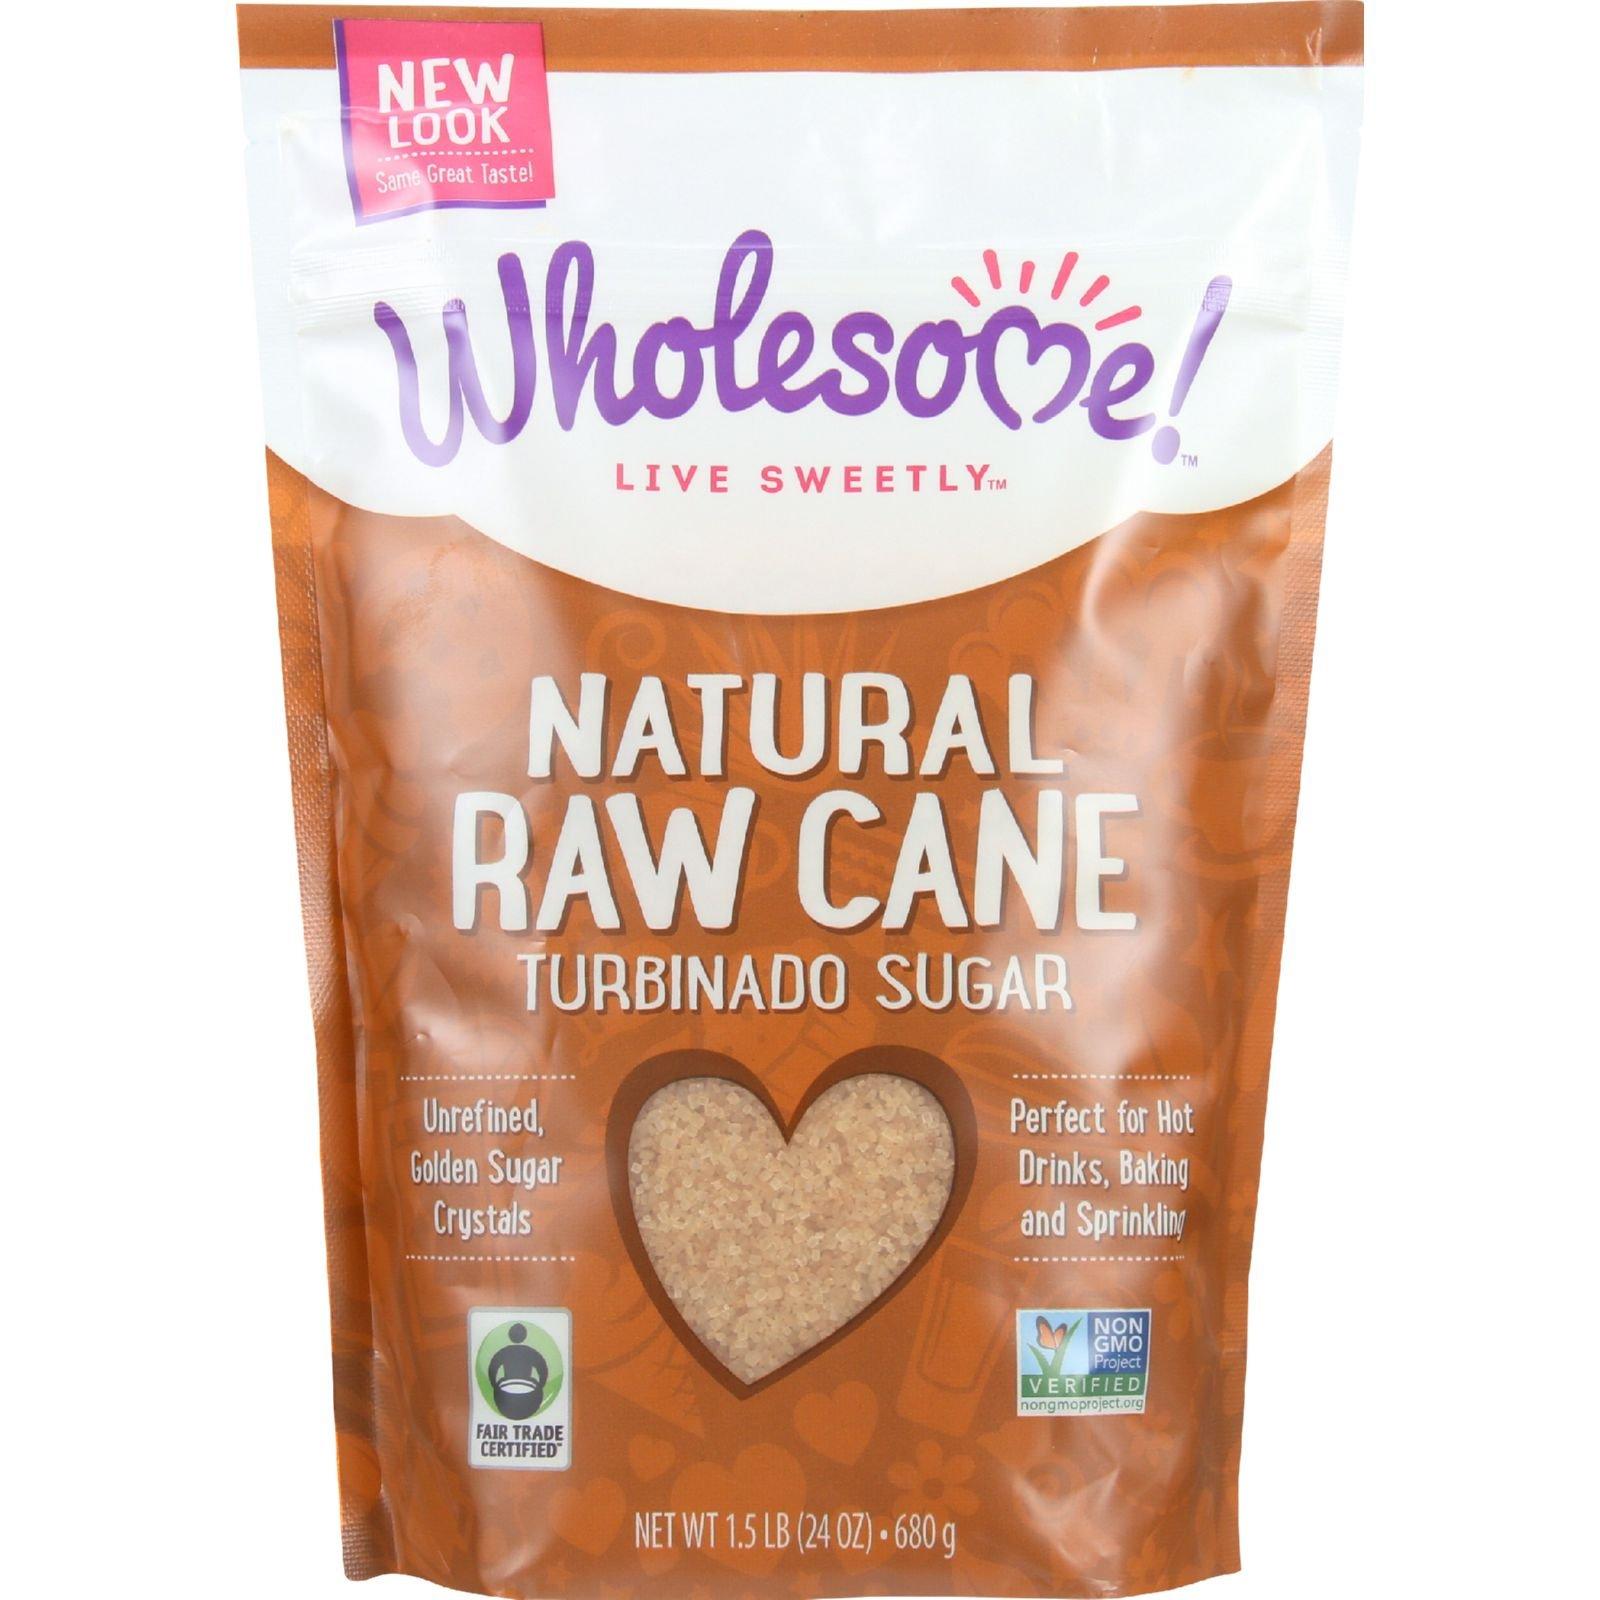 Wholesome Sweeteners Sugar - Natural Raw Cane - Turbinado - Fair Trade - 1.5 lb - case of 12 - Gluten Free -